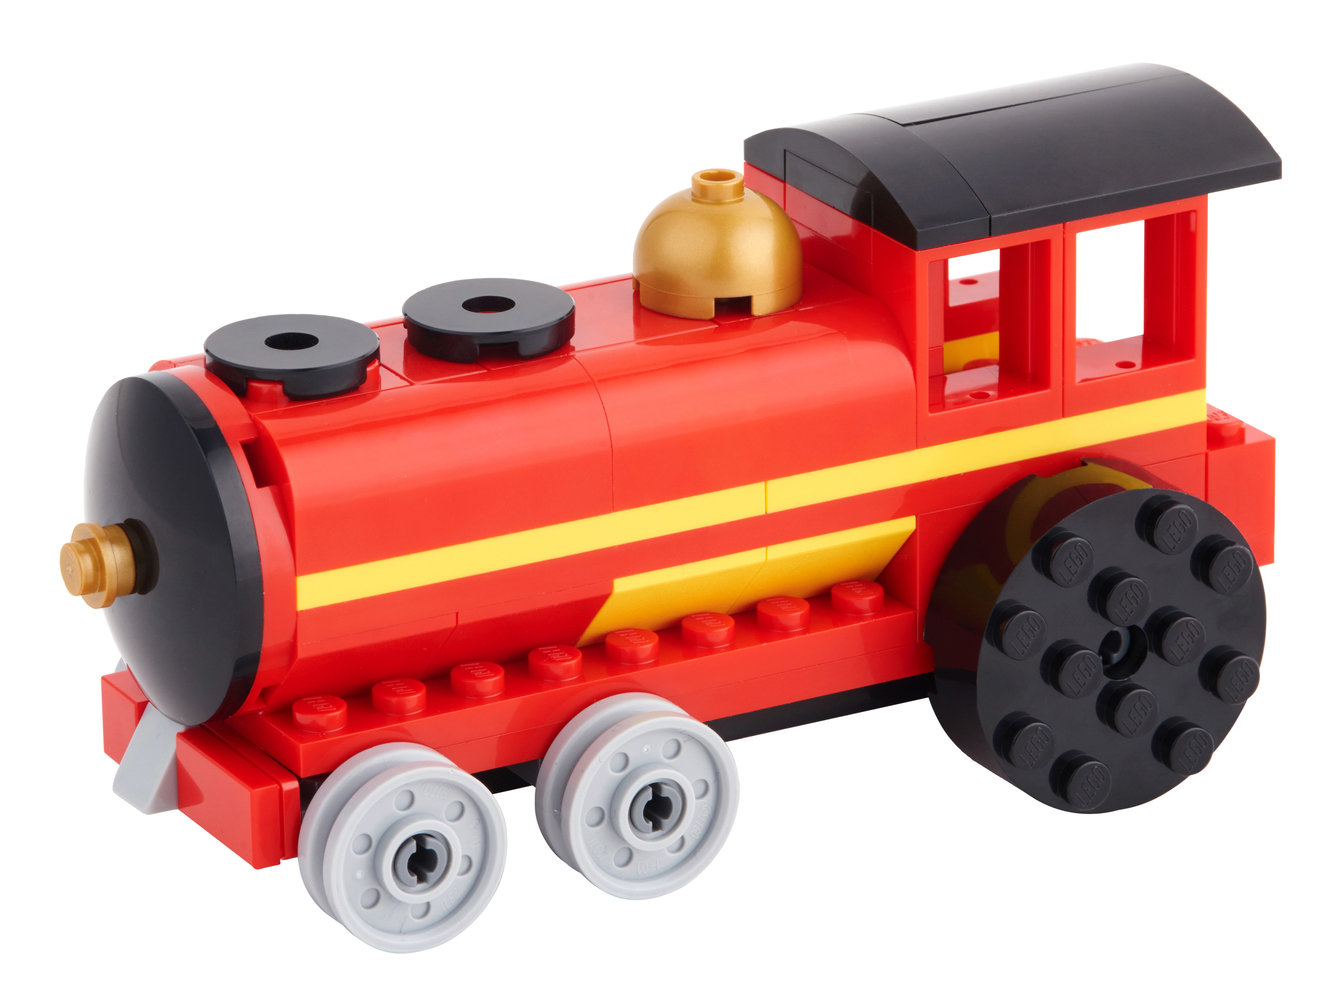 60th Anniversary Classic Wooden Train